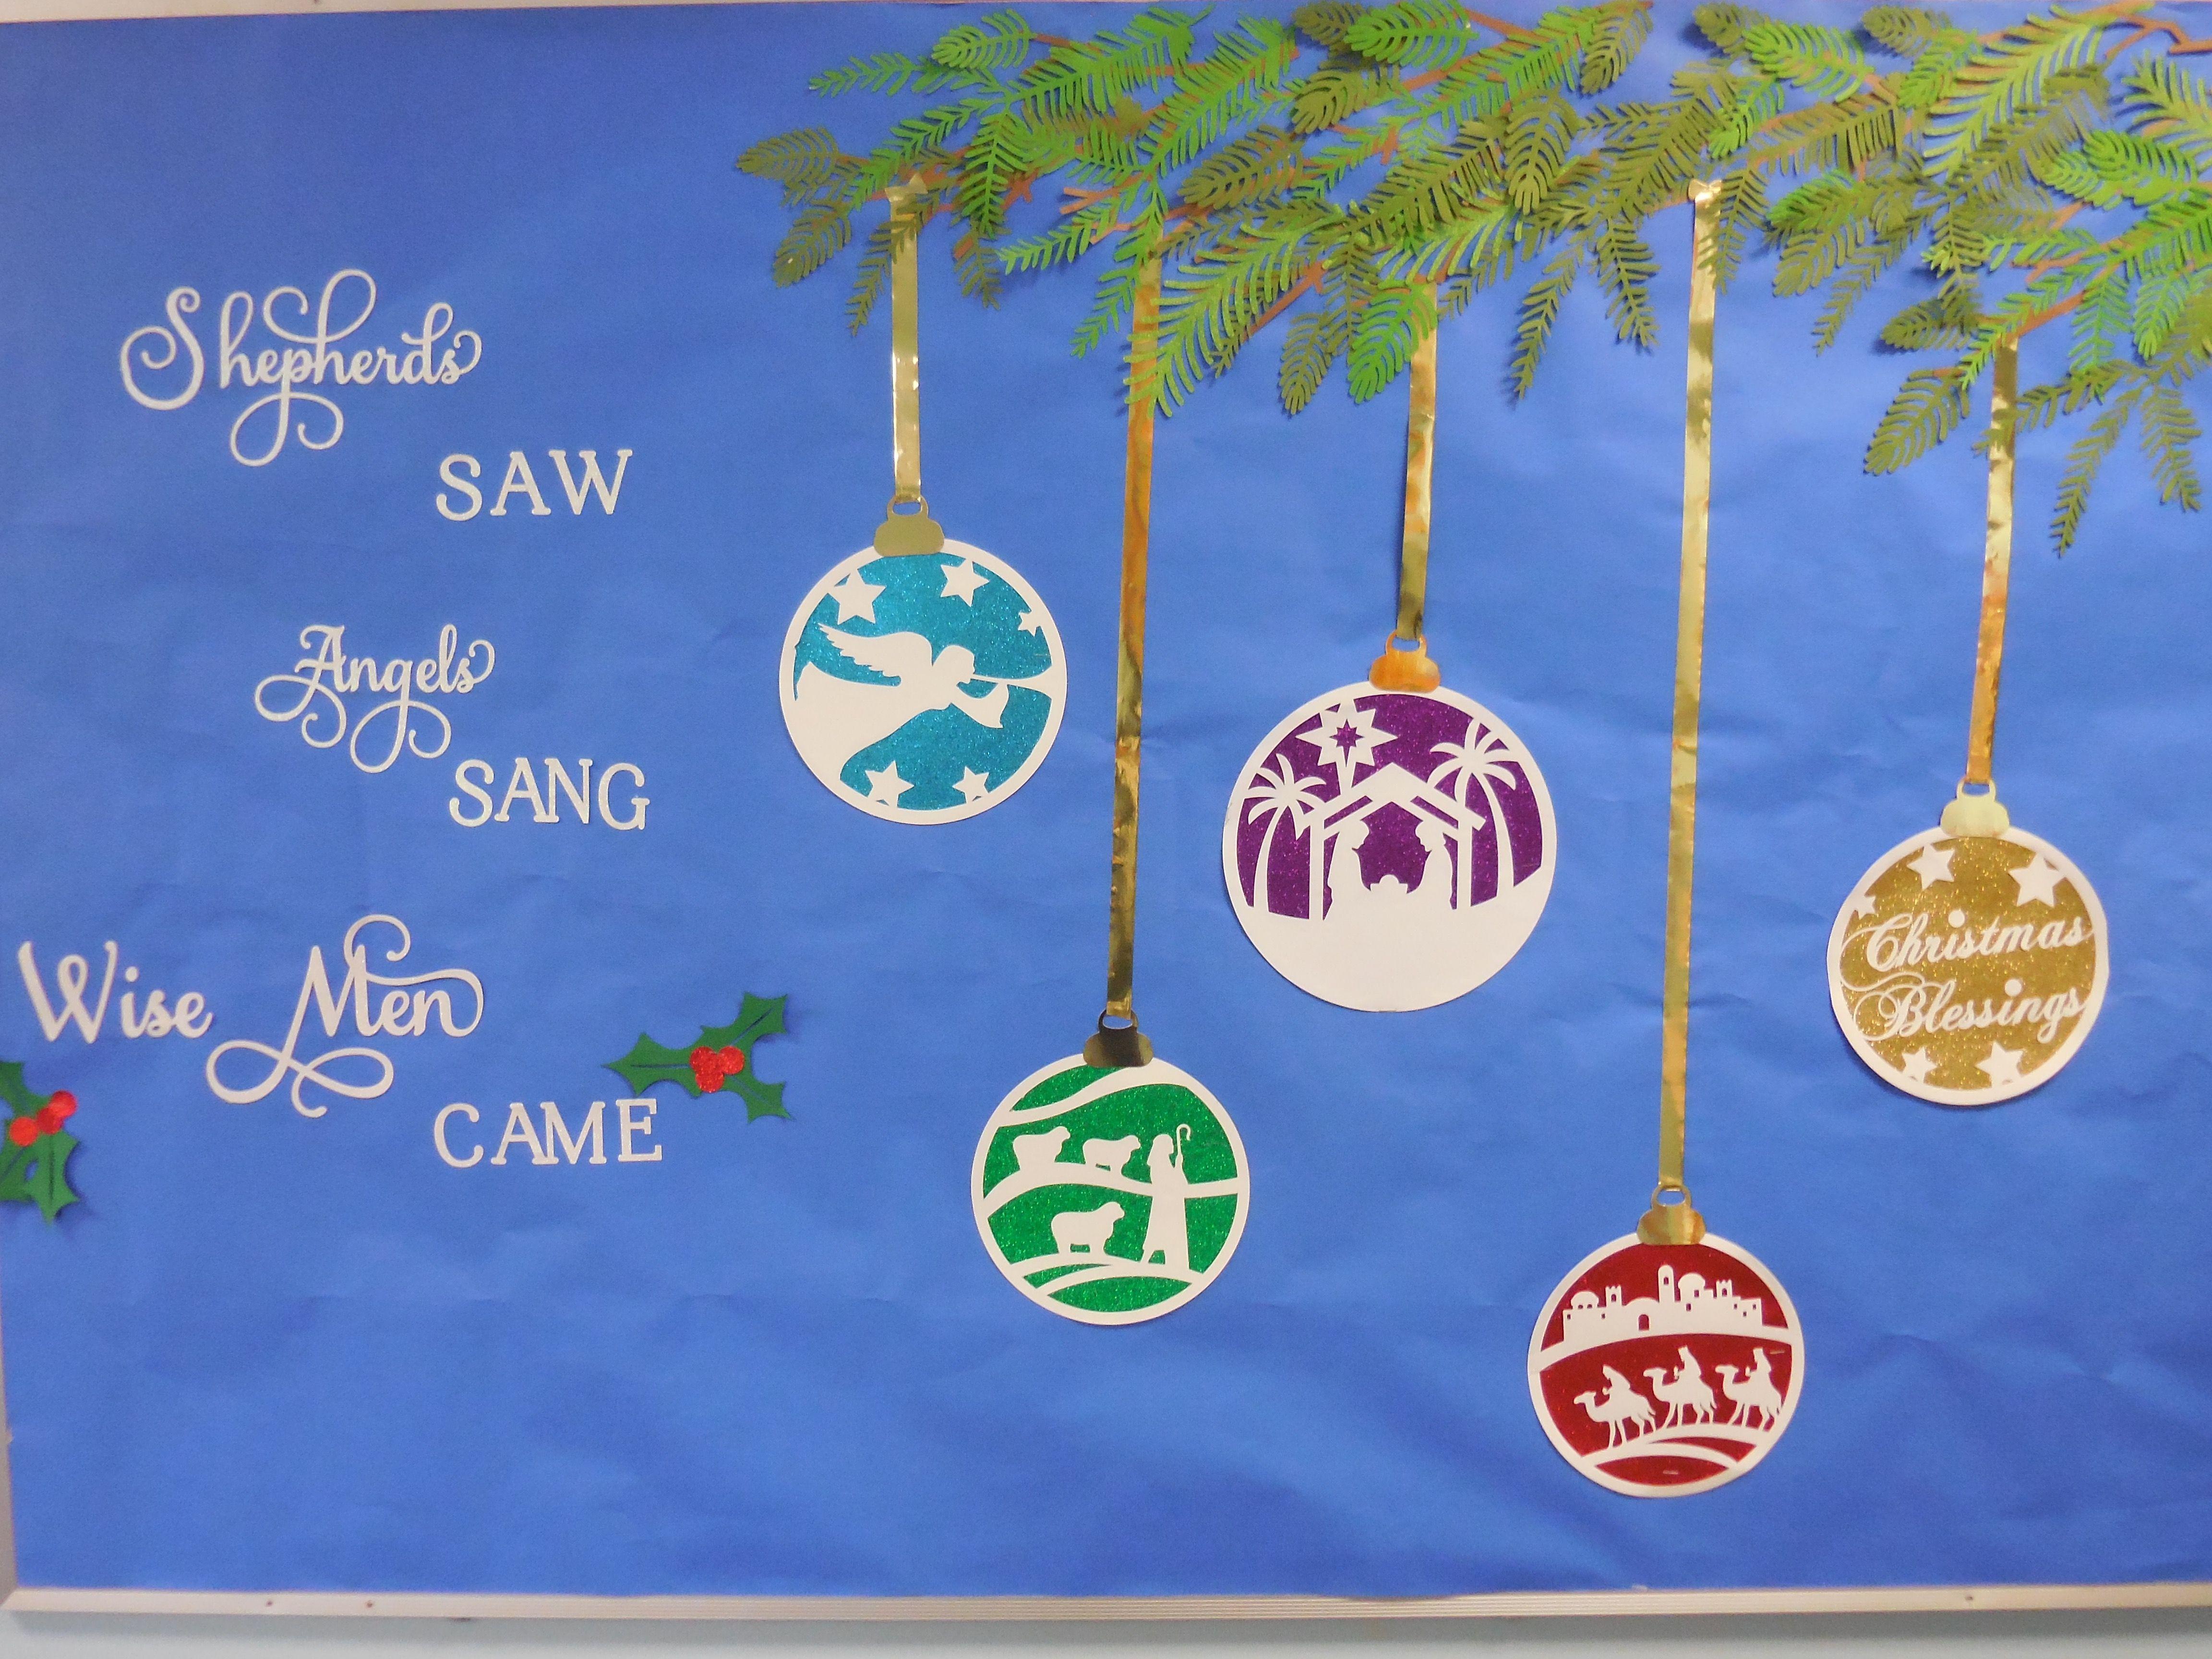 December Christmas Christian Ornaments Wisemen